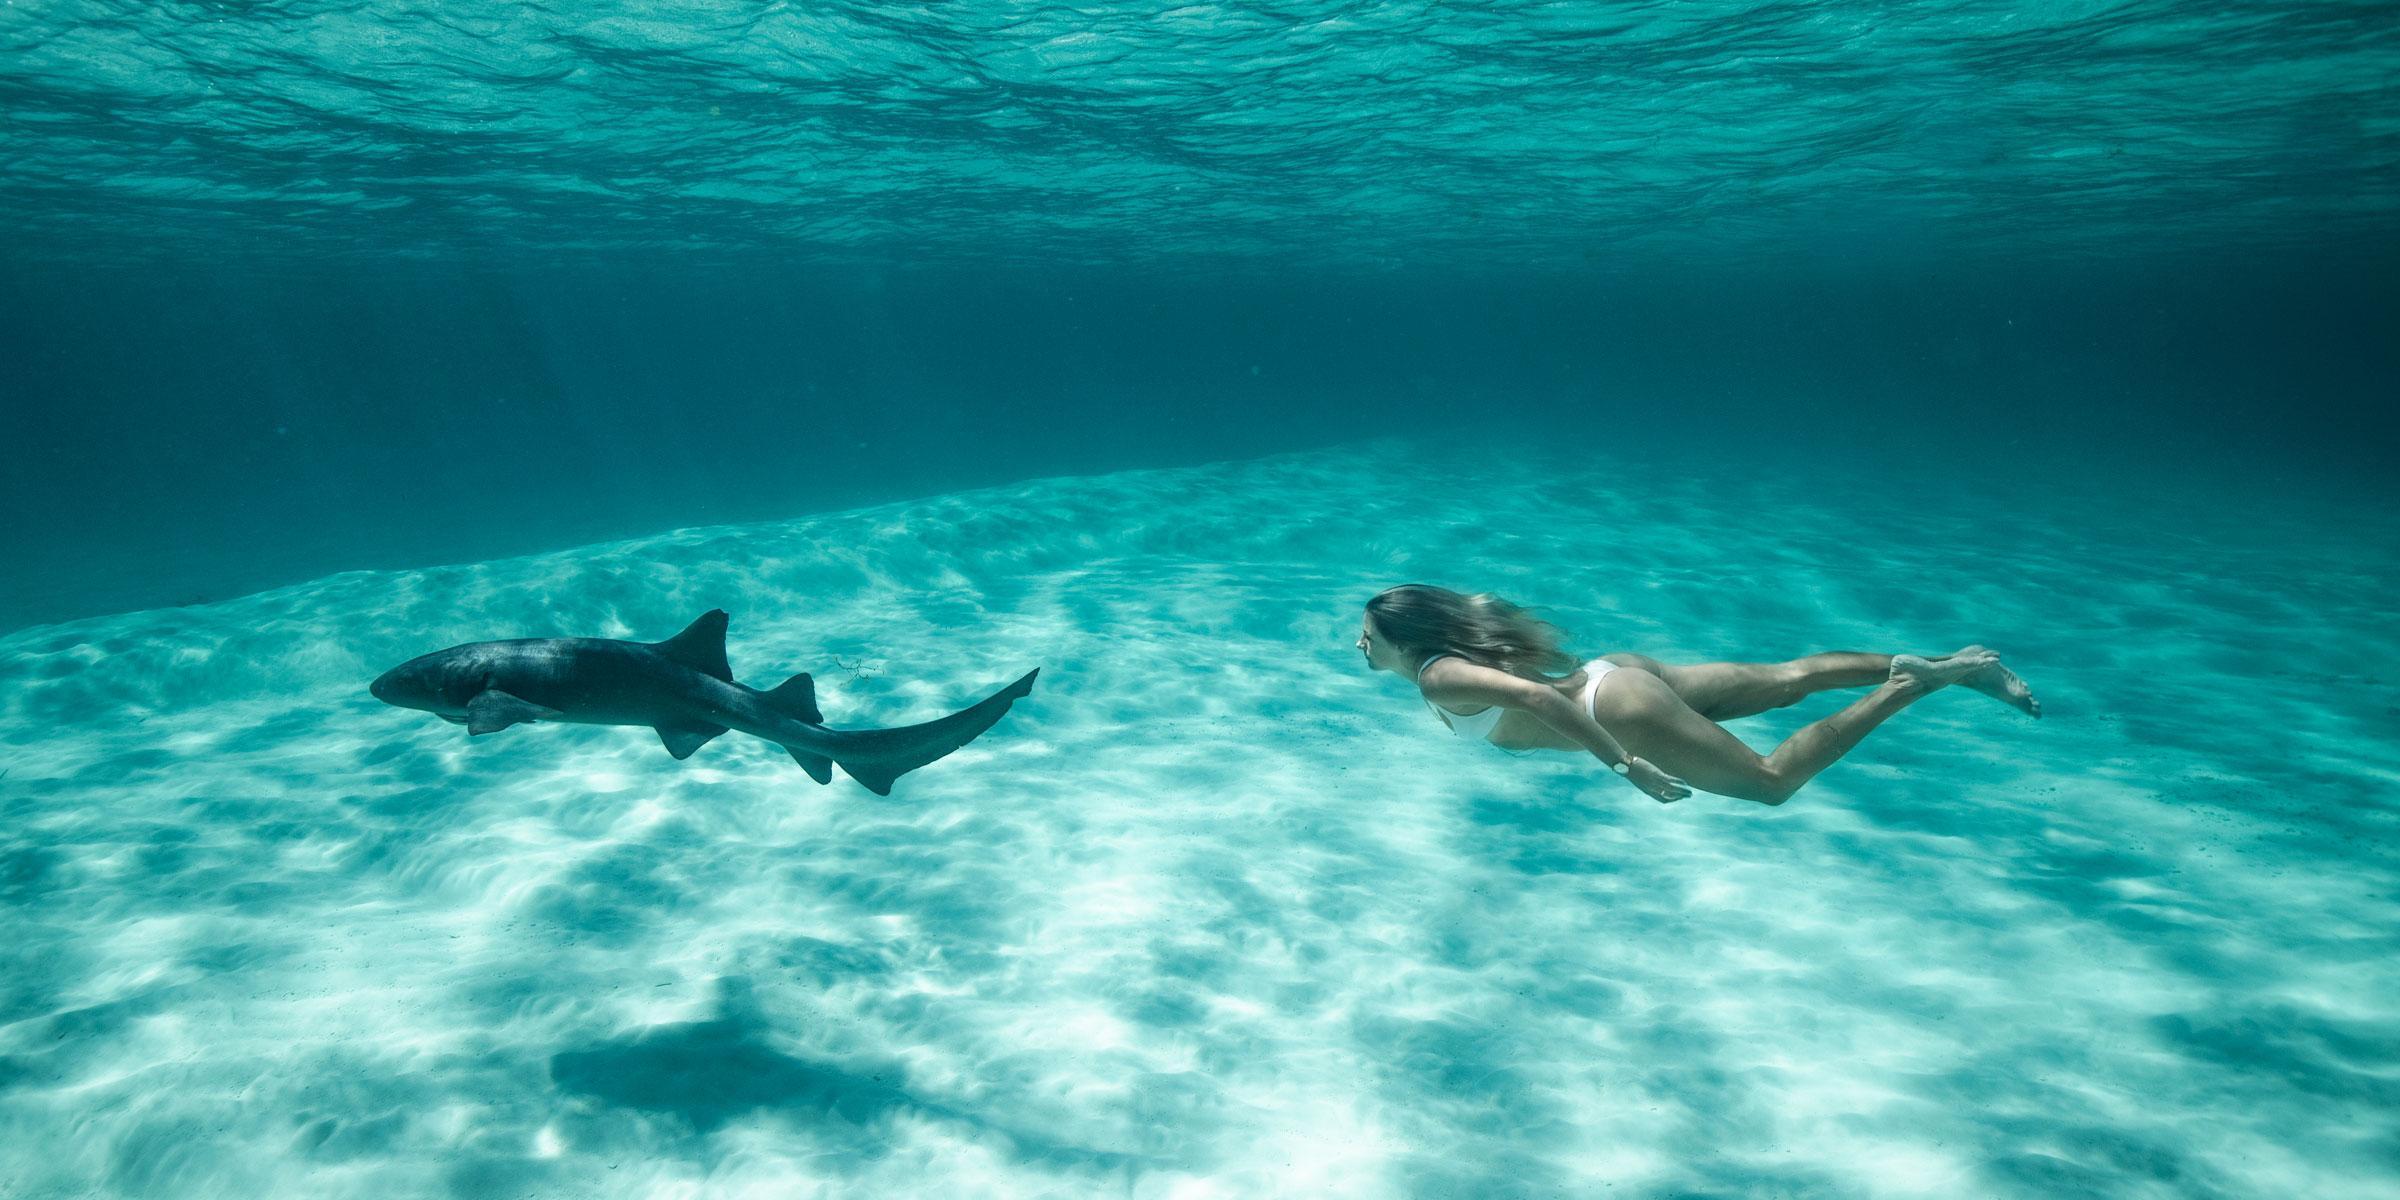 Swimming with nurse sharks in the Exumas, Bahamas